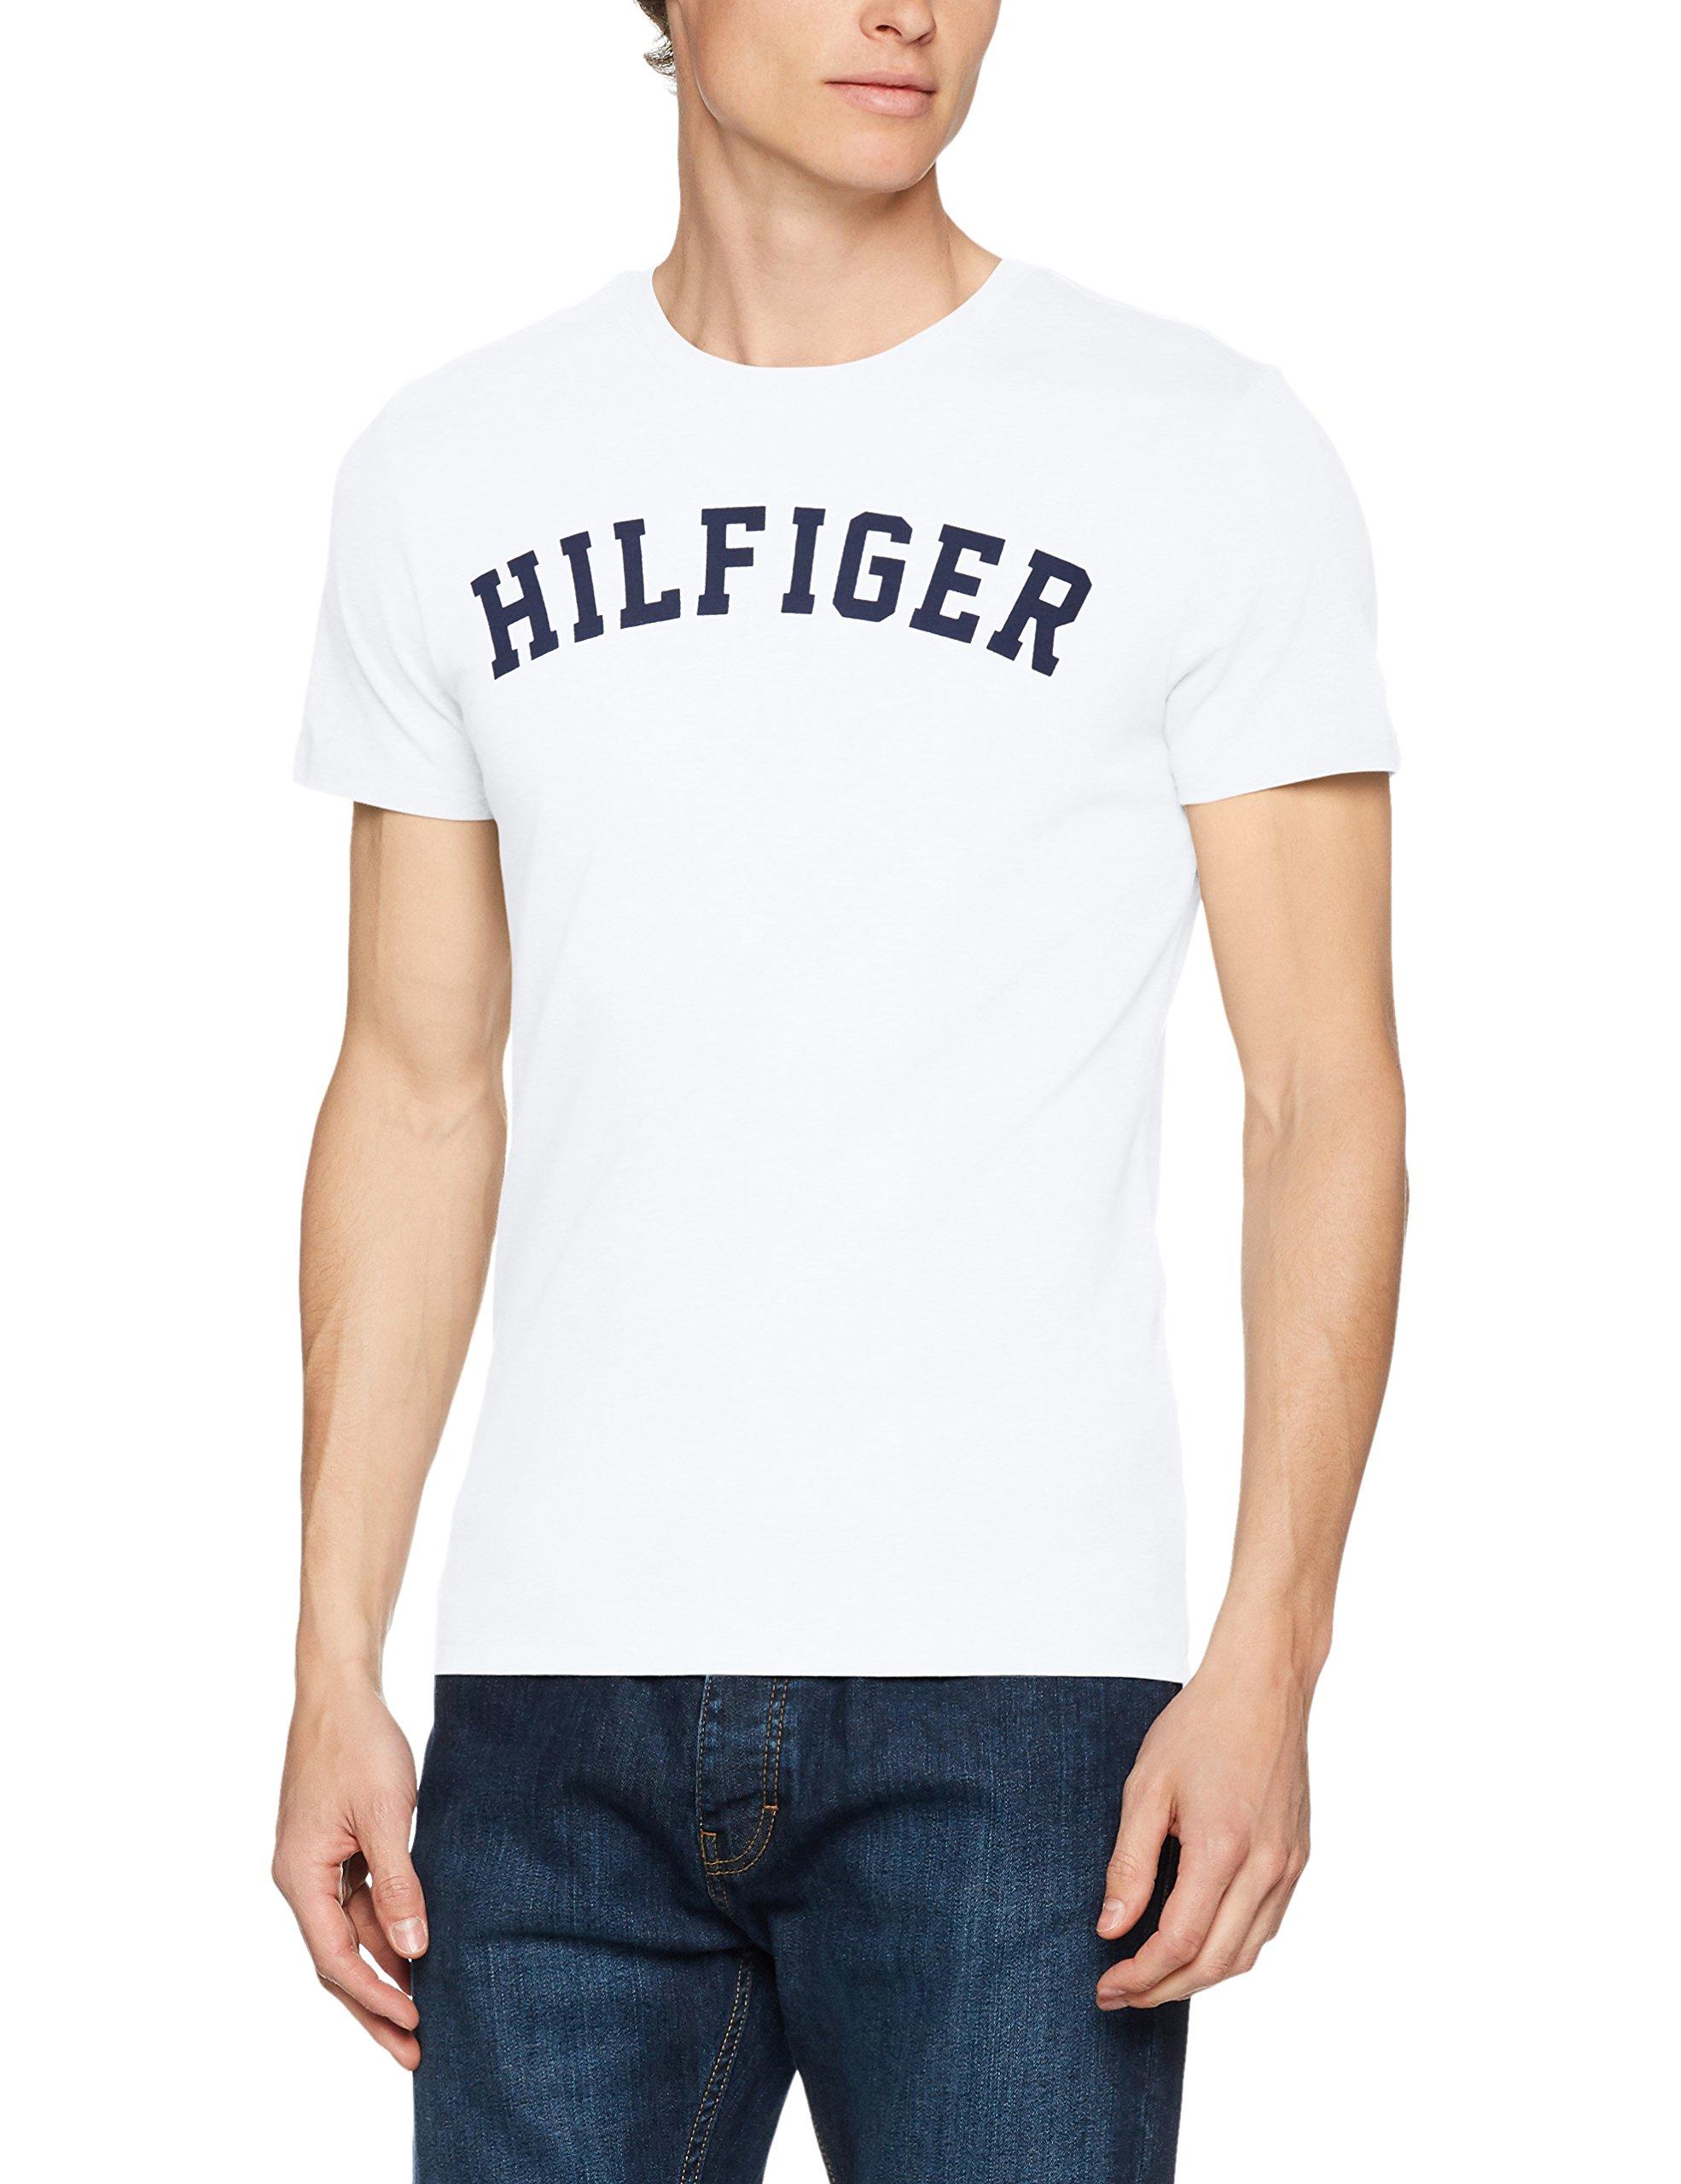 TOMMY HILFIGERメンズSS TシャツロゴTシャツ